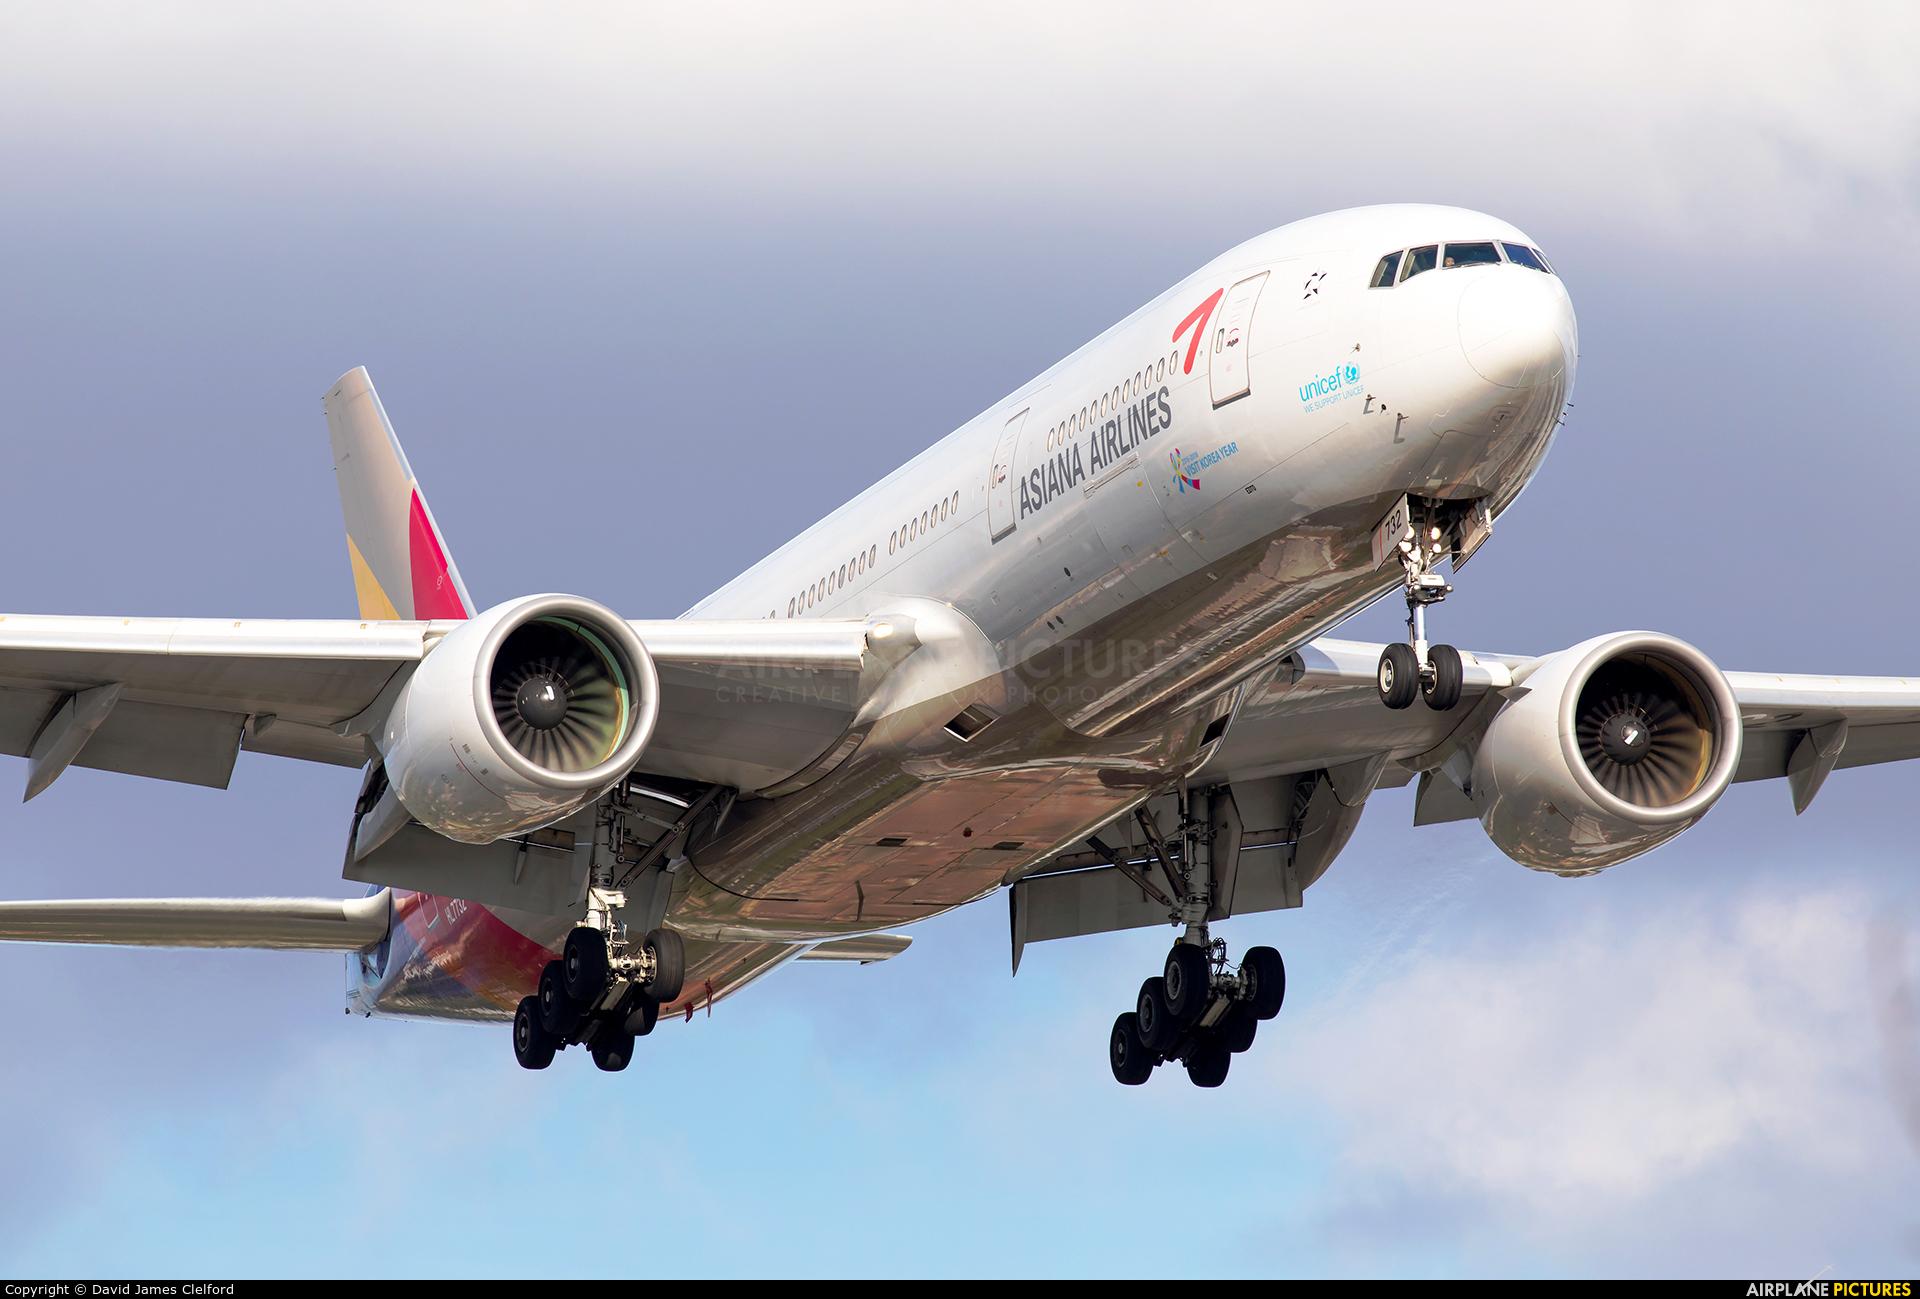 Asiana Airlines HL7732 aircraft at London - Heathrow